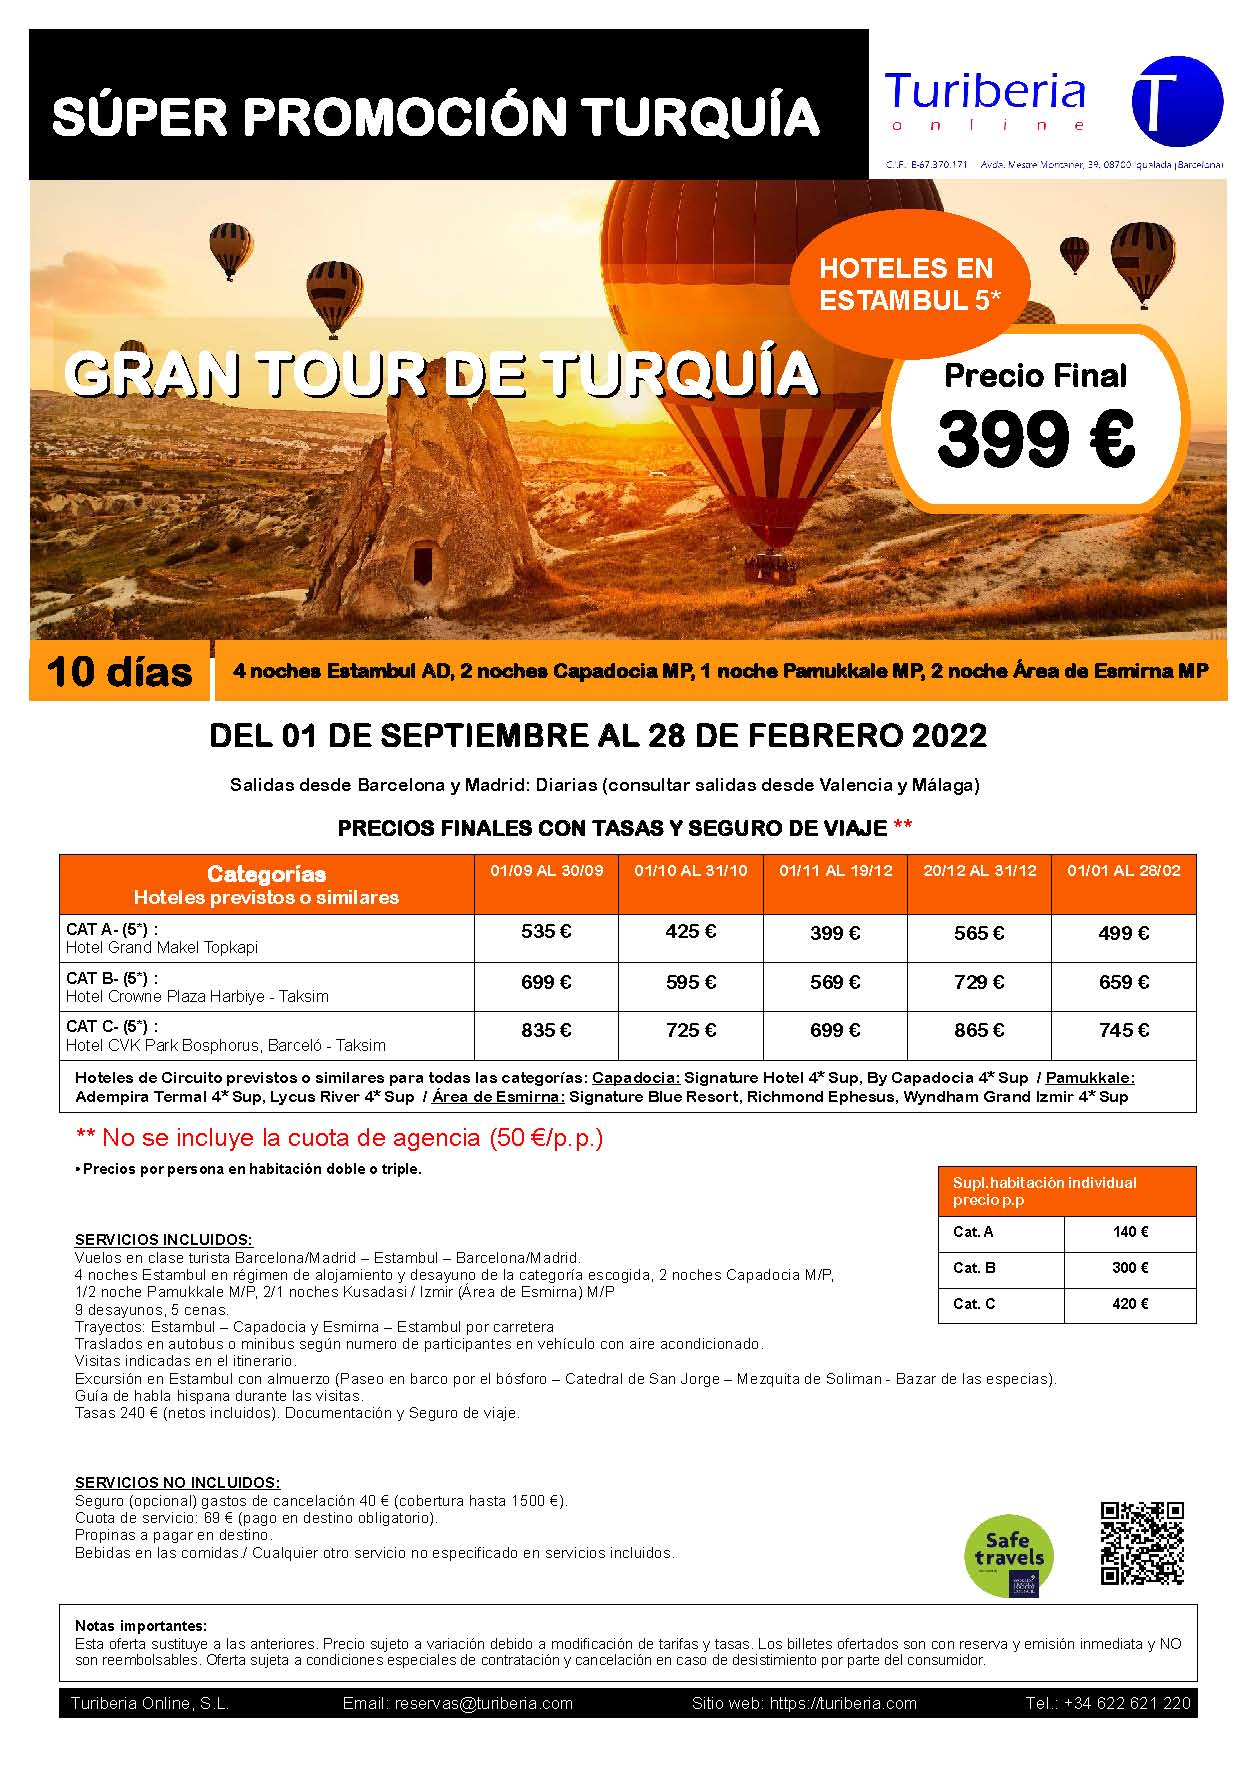 Oferta Turiberia Gran Tour de Turquía 2021 Circuito 10 dias con vuelos Turkish Airlines